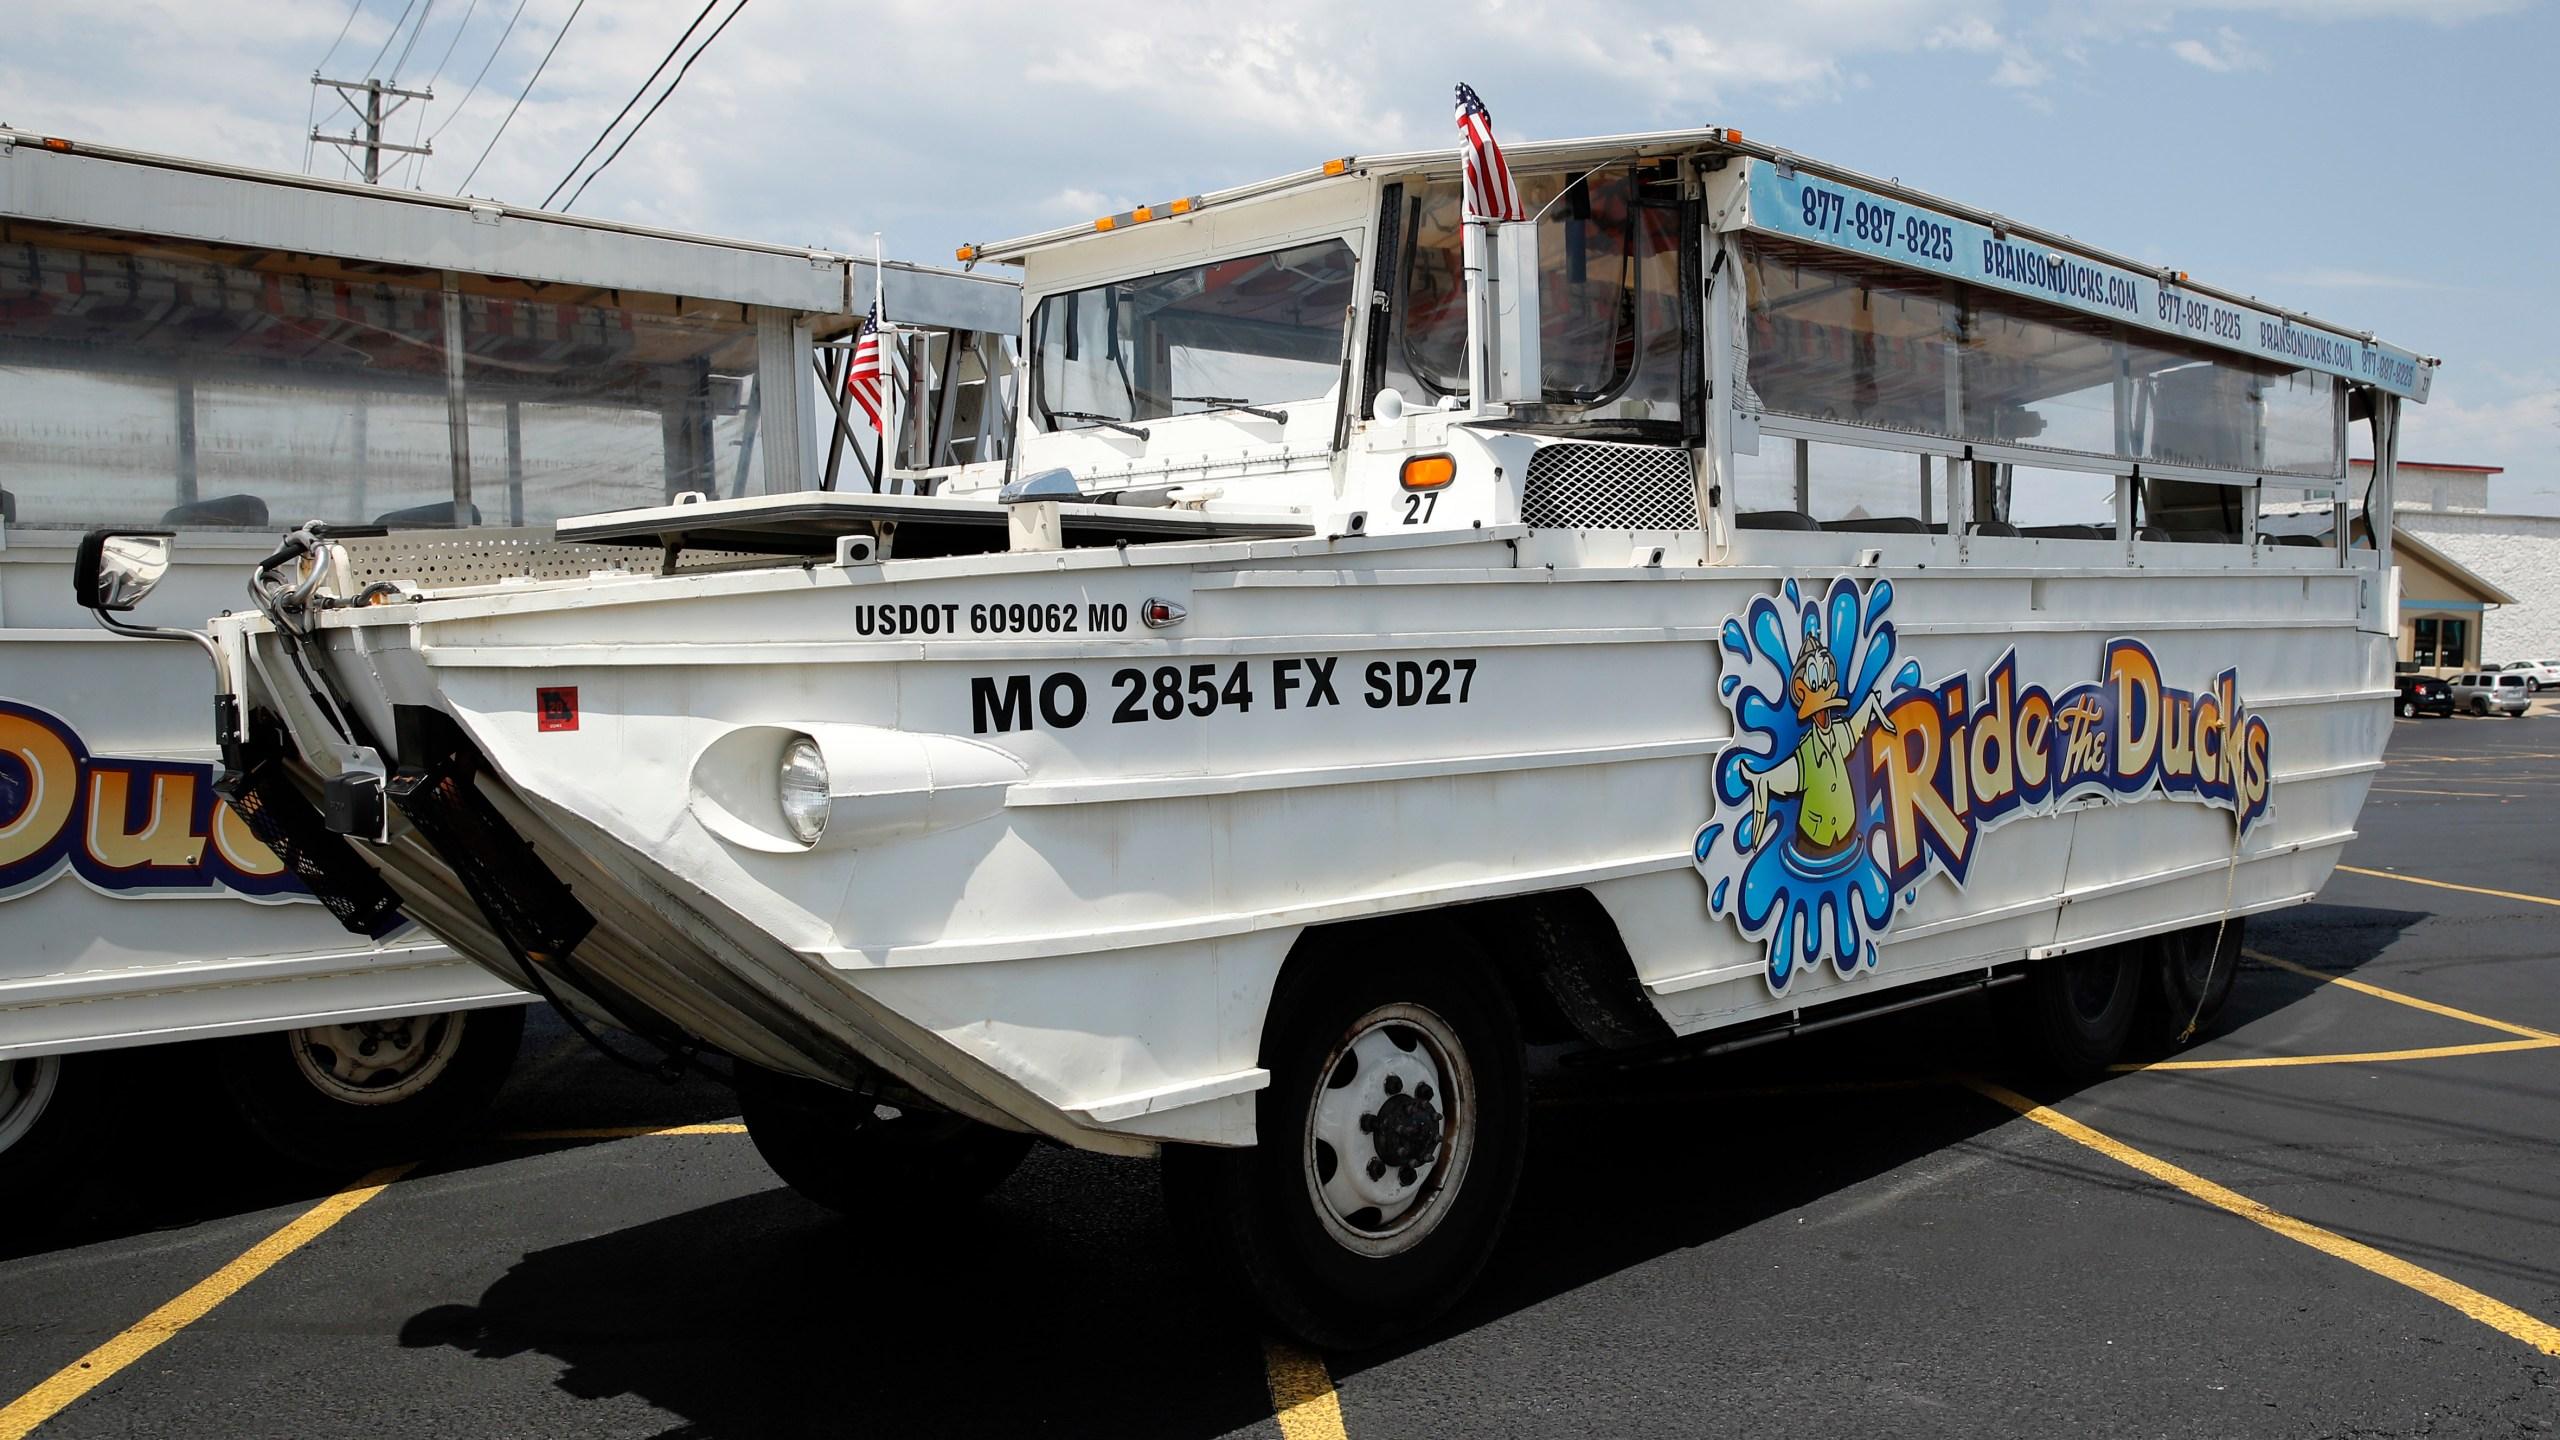 Missouri_Boat_Accident_Duck_Boats_43143-159532.jpg33946765